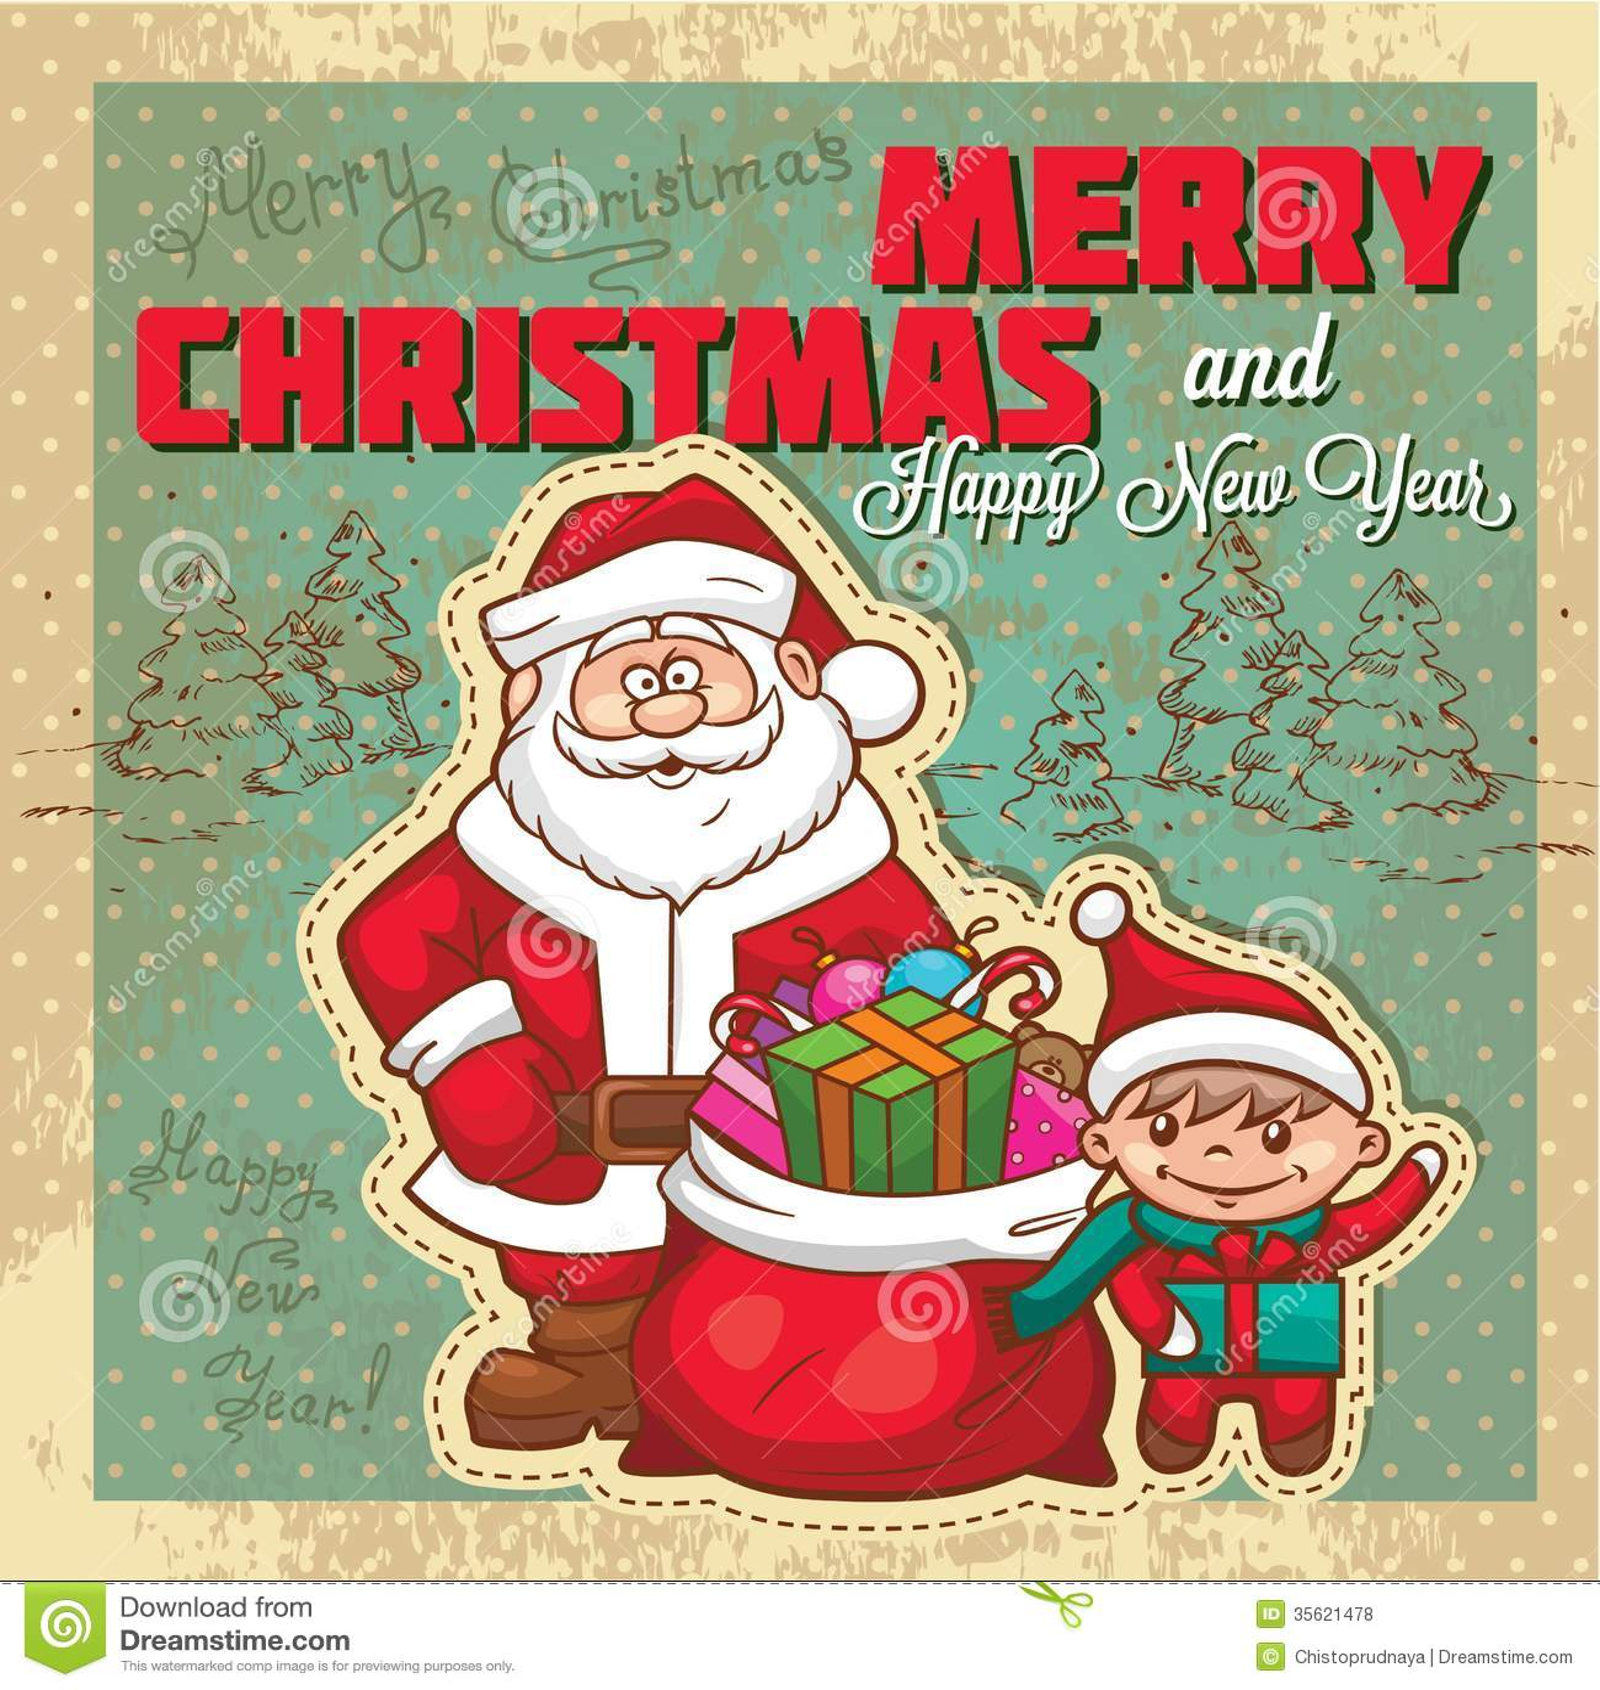 Retro Christmas Invitation Card Royalty Free Stock Images - Image ...